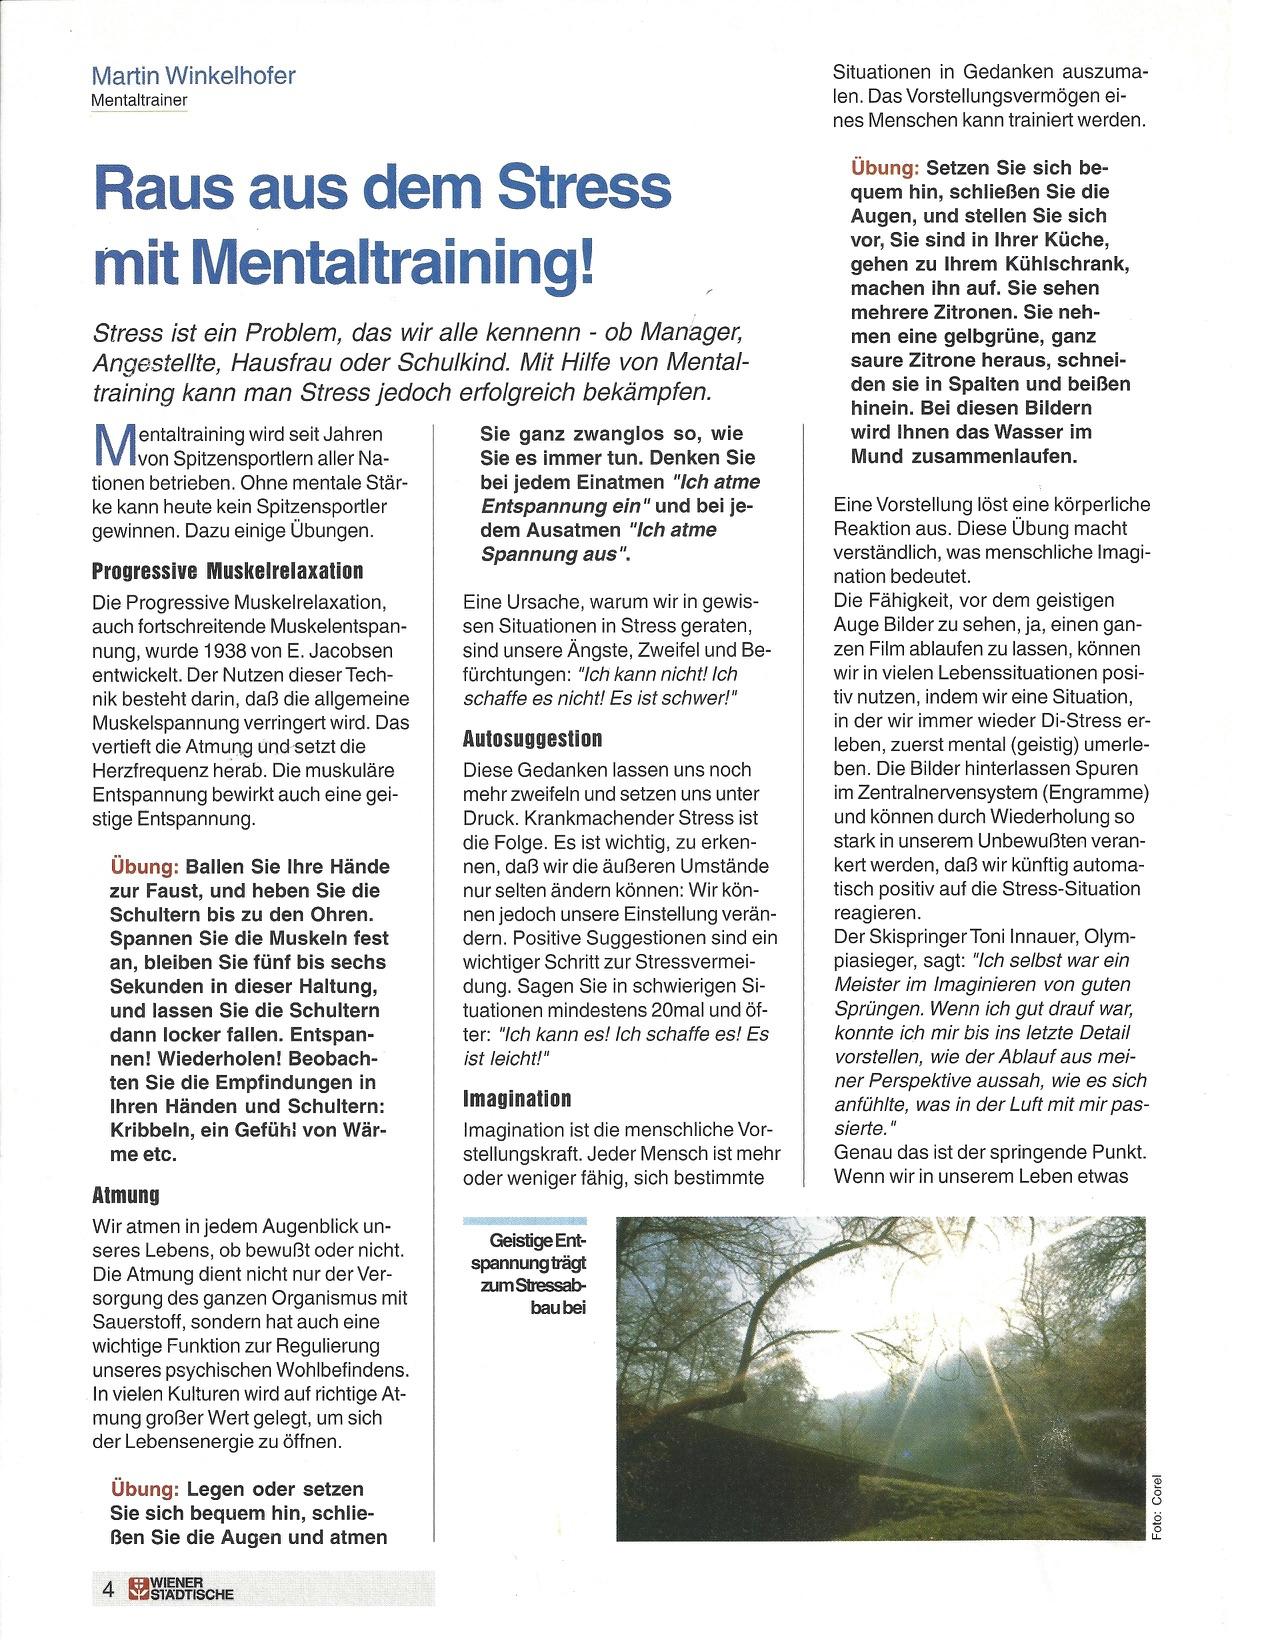 Mentaltraining mit Martin Winkelhofer